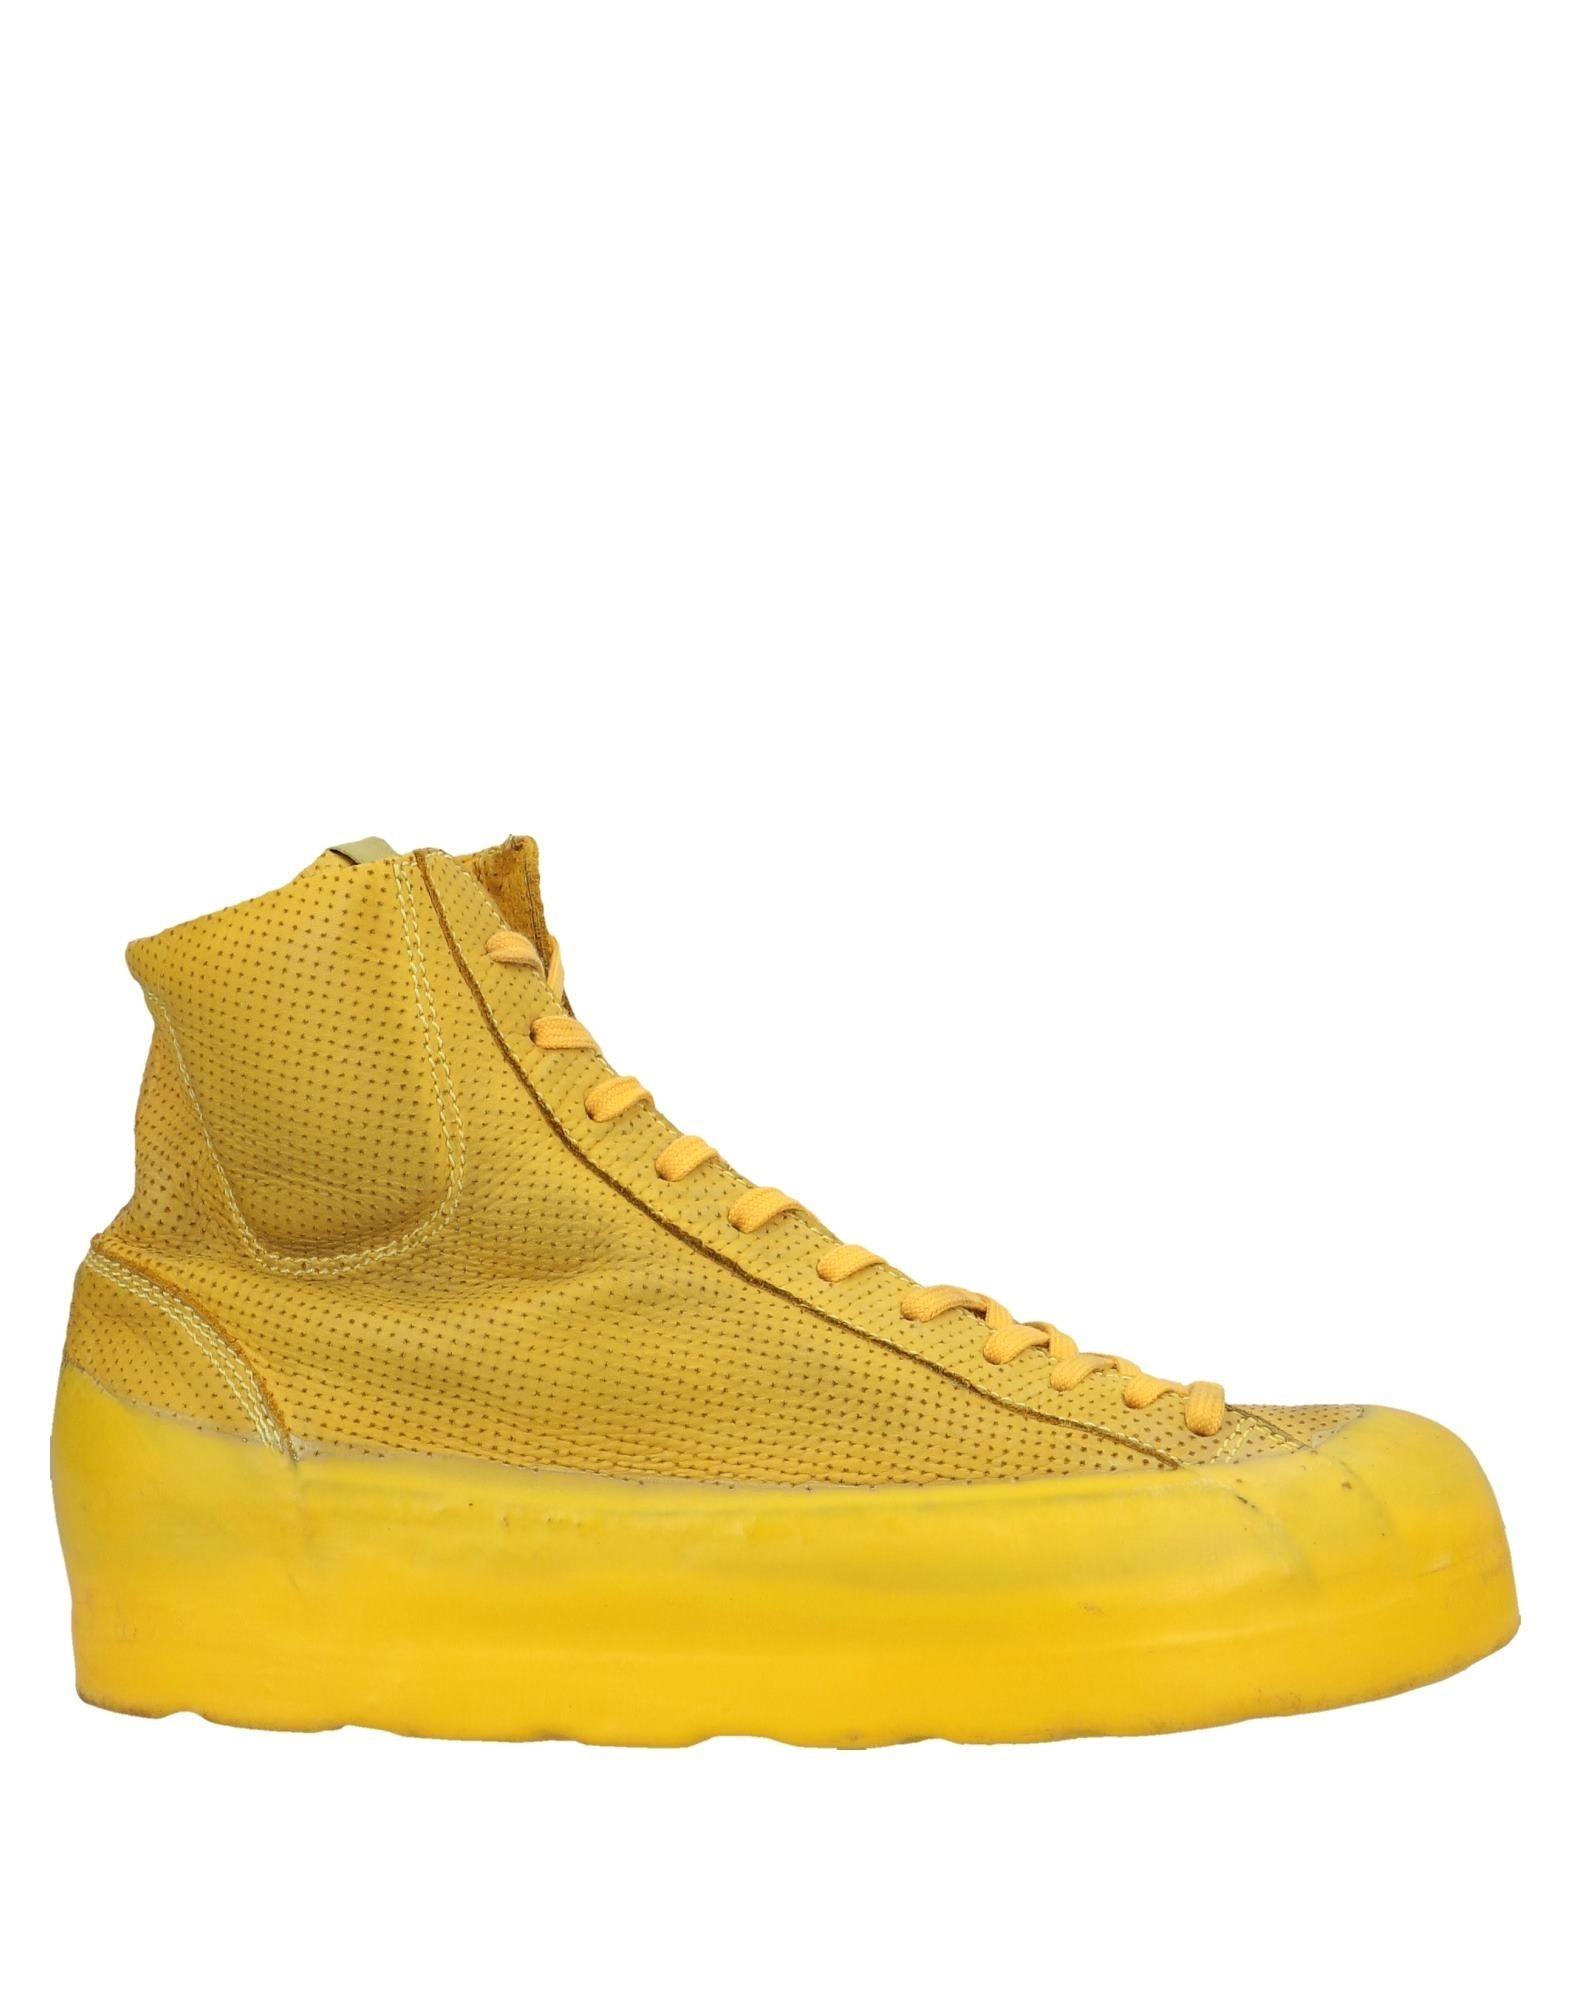 O.X.S. Preis-Leistungs-Verhältnis, Rubber Soul Sneakers Herren Gutes Preis-Leistungs-Verhältnis, O.X.S. es lohnt sich db93c1